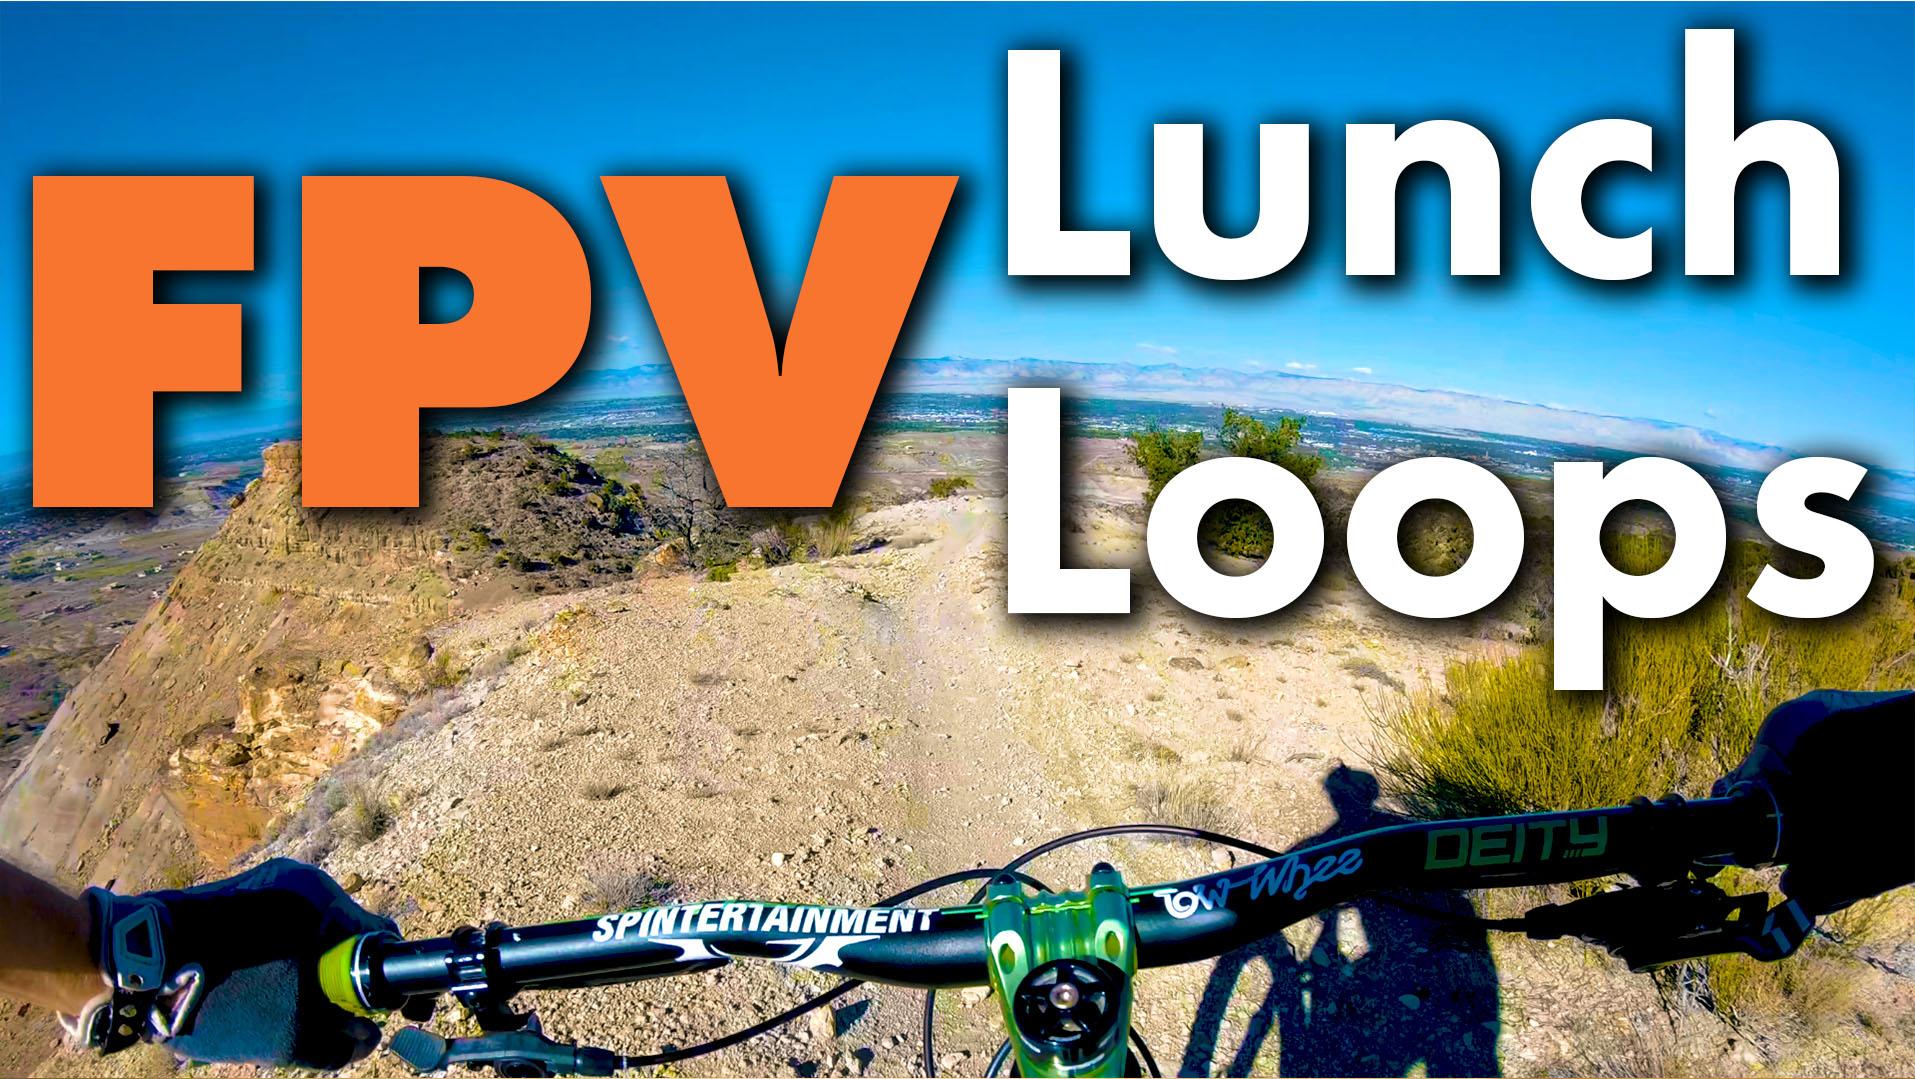 FPV Lunch Loops Thumbnail.jpg